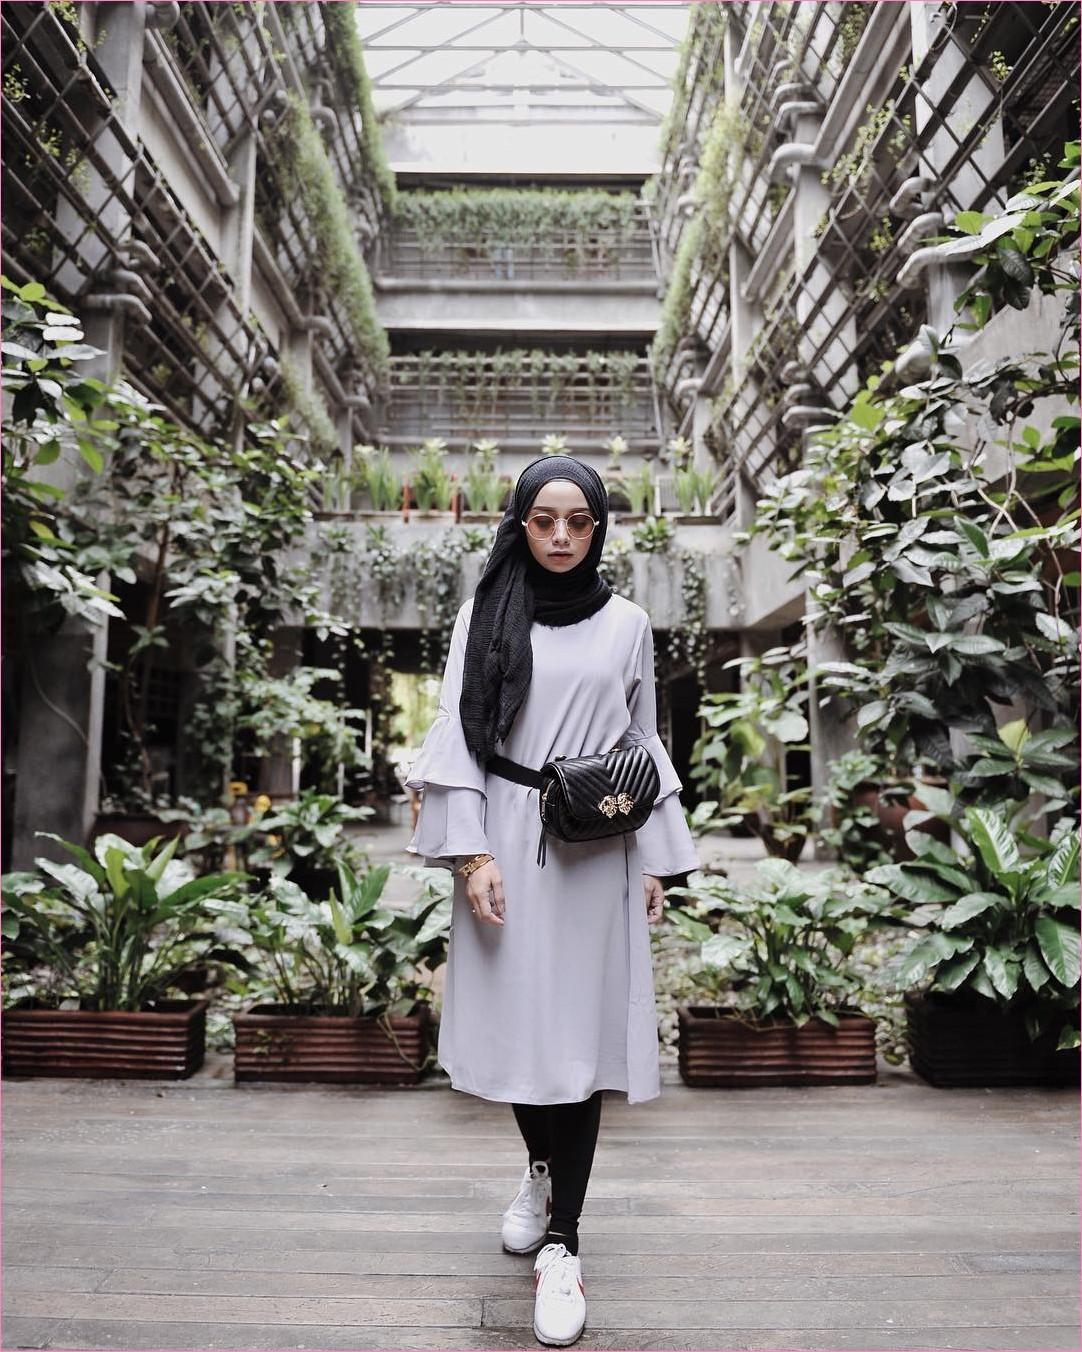 Outfit Kerudung Pashmina Ala Selebgram 2018 hijab pashmina rawis tas pinggang wanita baju tunic ungu pastel mangset krem kacamata oren legging hitam kets sneakers putih ootd trendy kekinian hijabers hotel ciput rajut tanaman